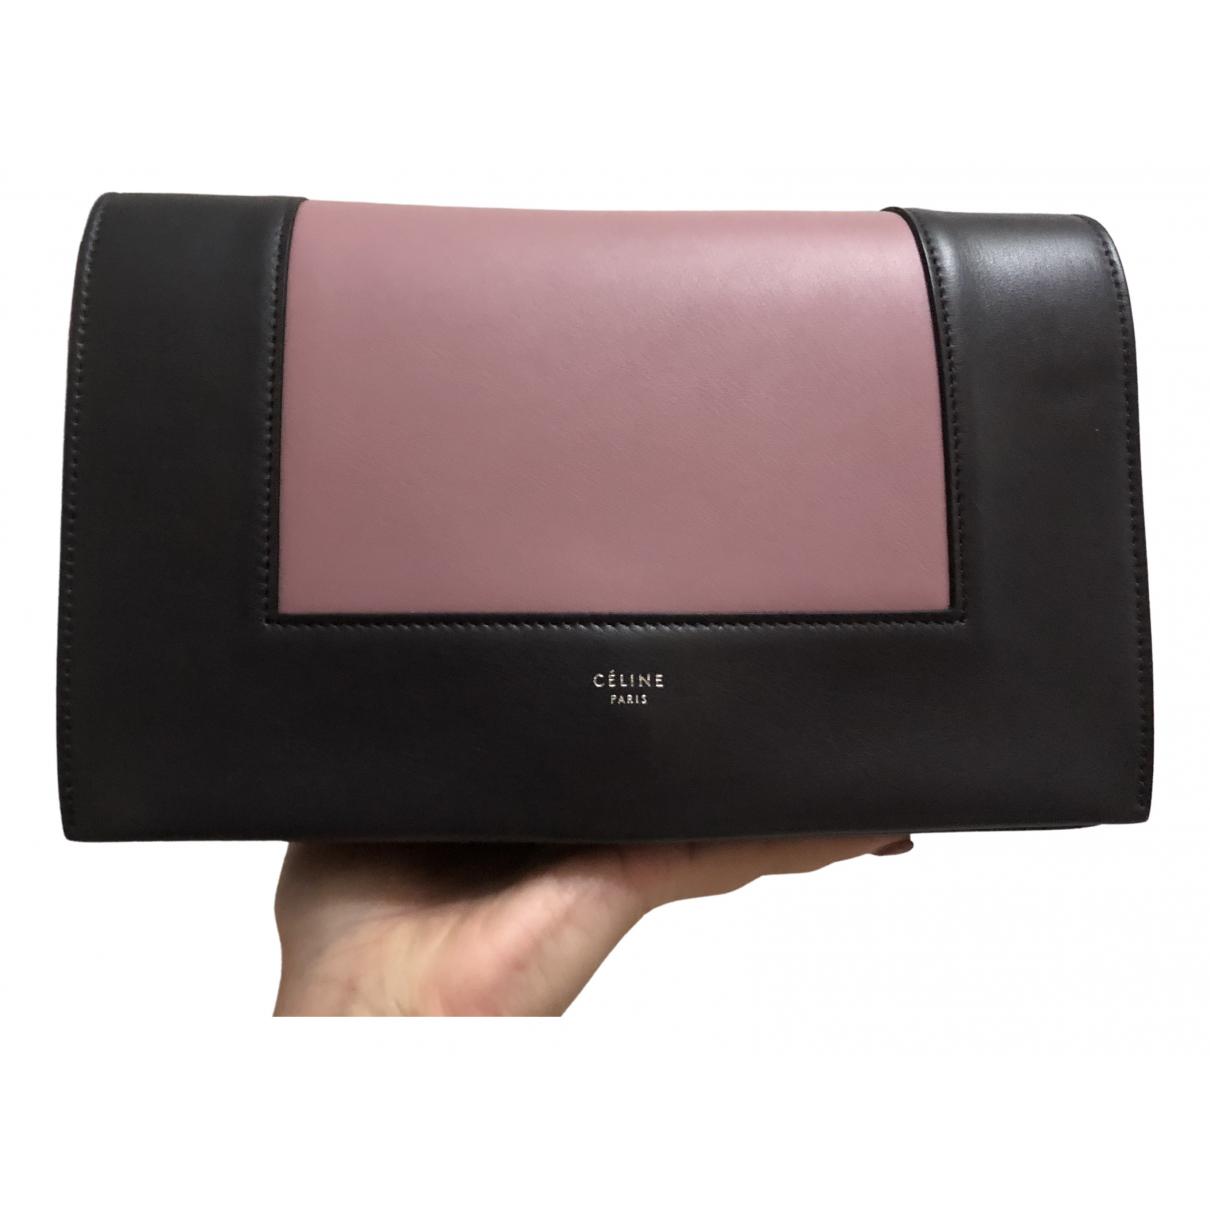 Celine - Sac a main Frame pour femme en cuir - rose